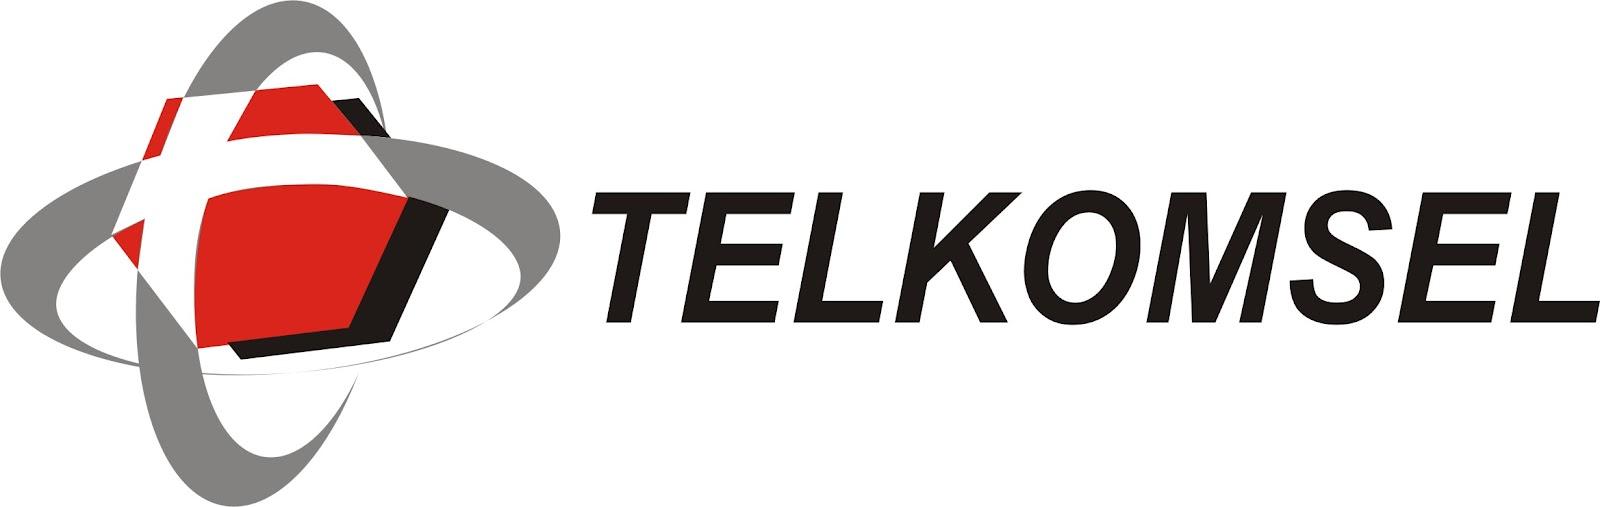 ... Gratis Telkomsel pasca Co.Id klip.telkomsel.com + tanpa Malak Pulsa